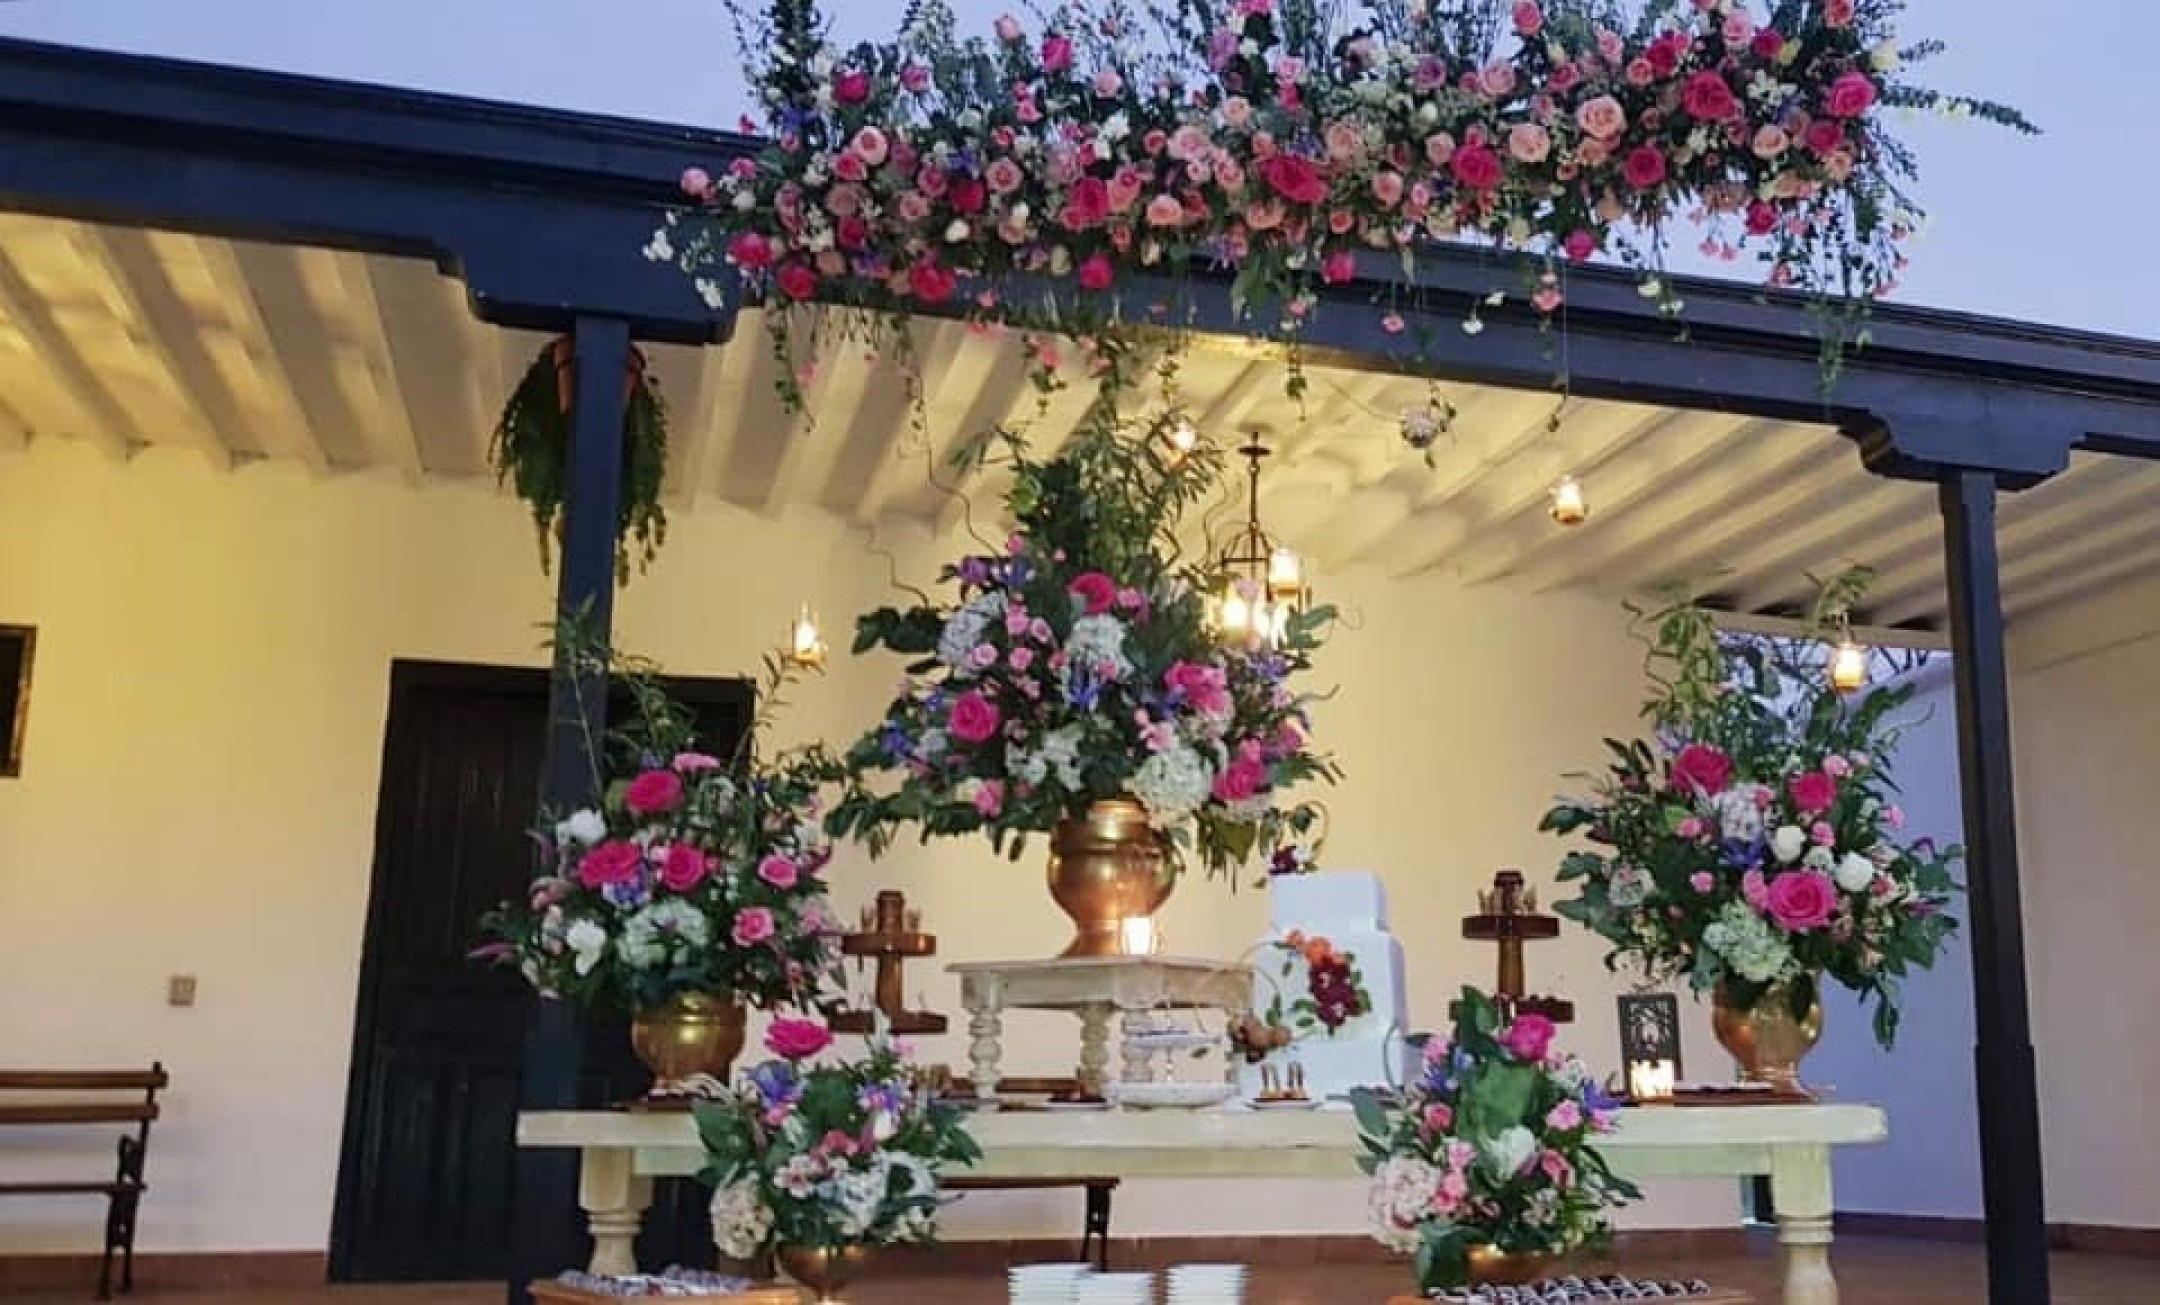 http://haciendabocanegra.com/images/chbn_AchmLlh8UM_large-1080_k0Xrd.jpg